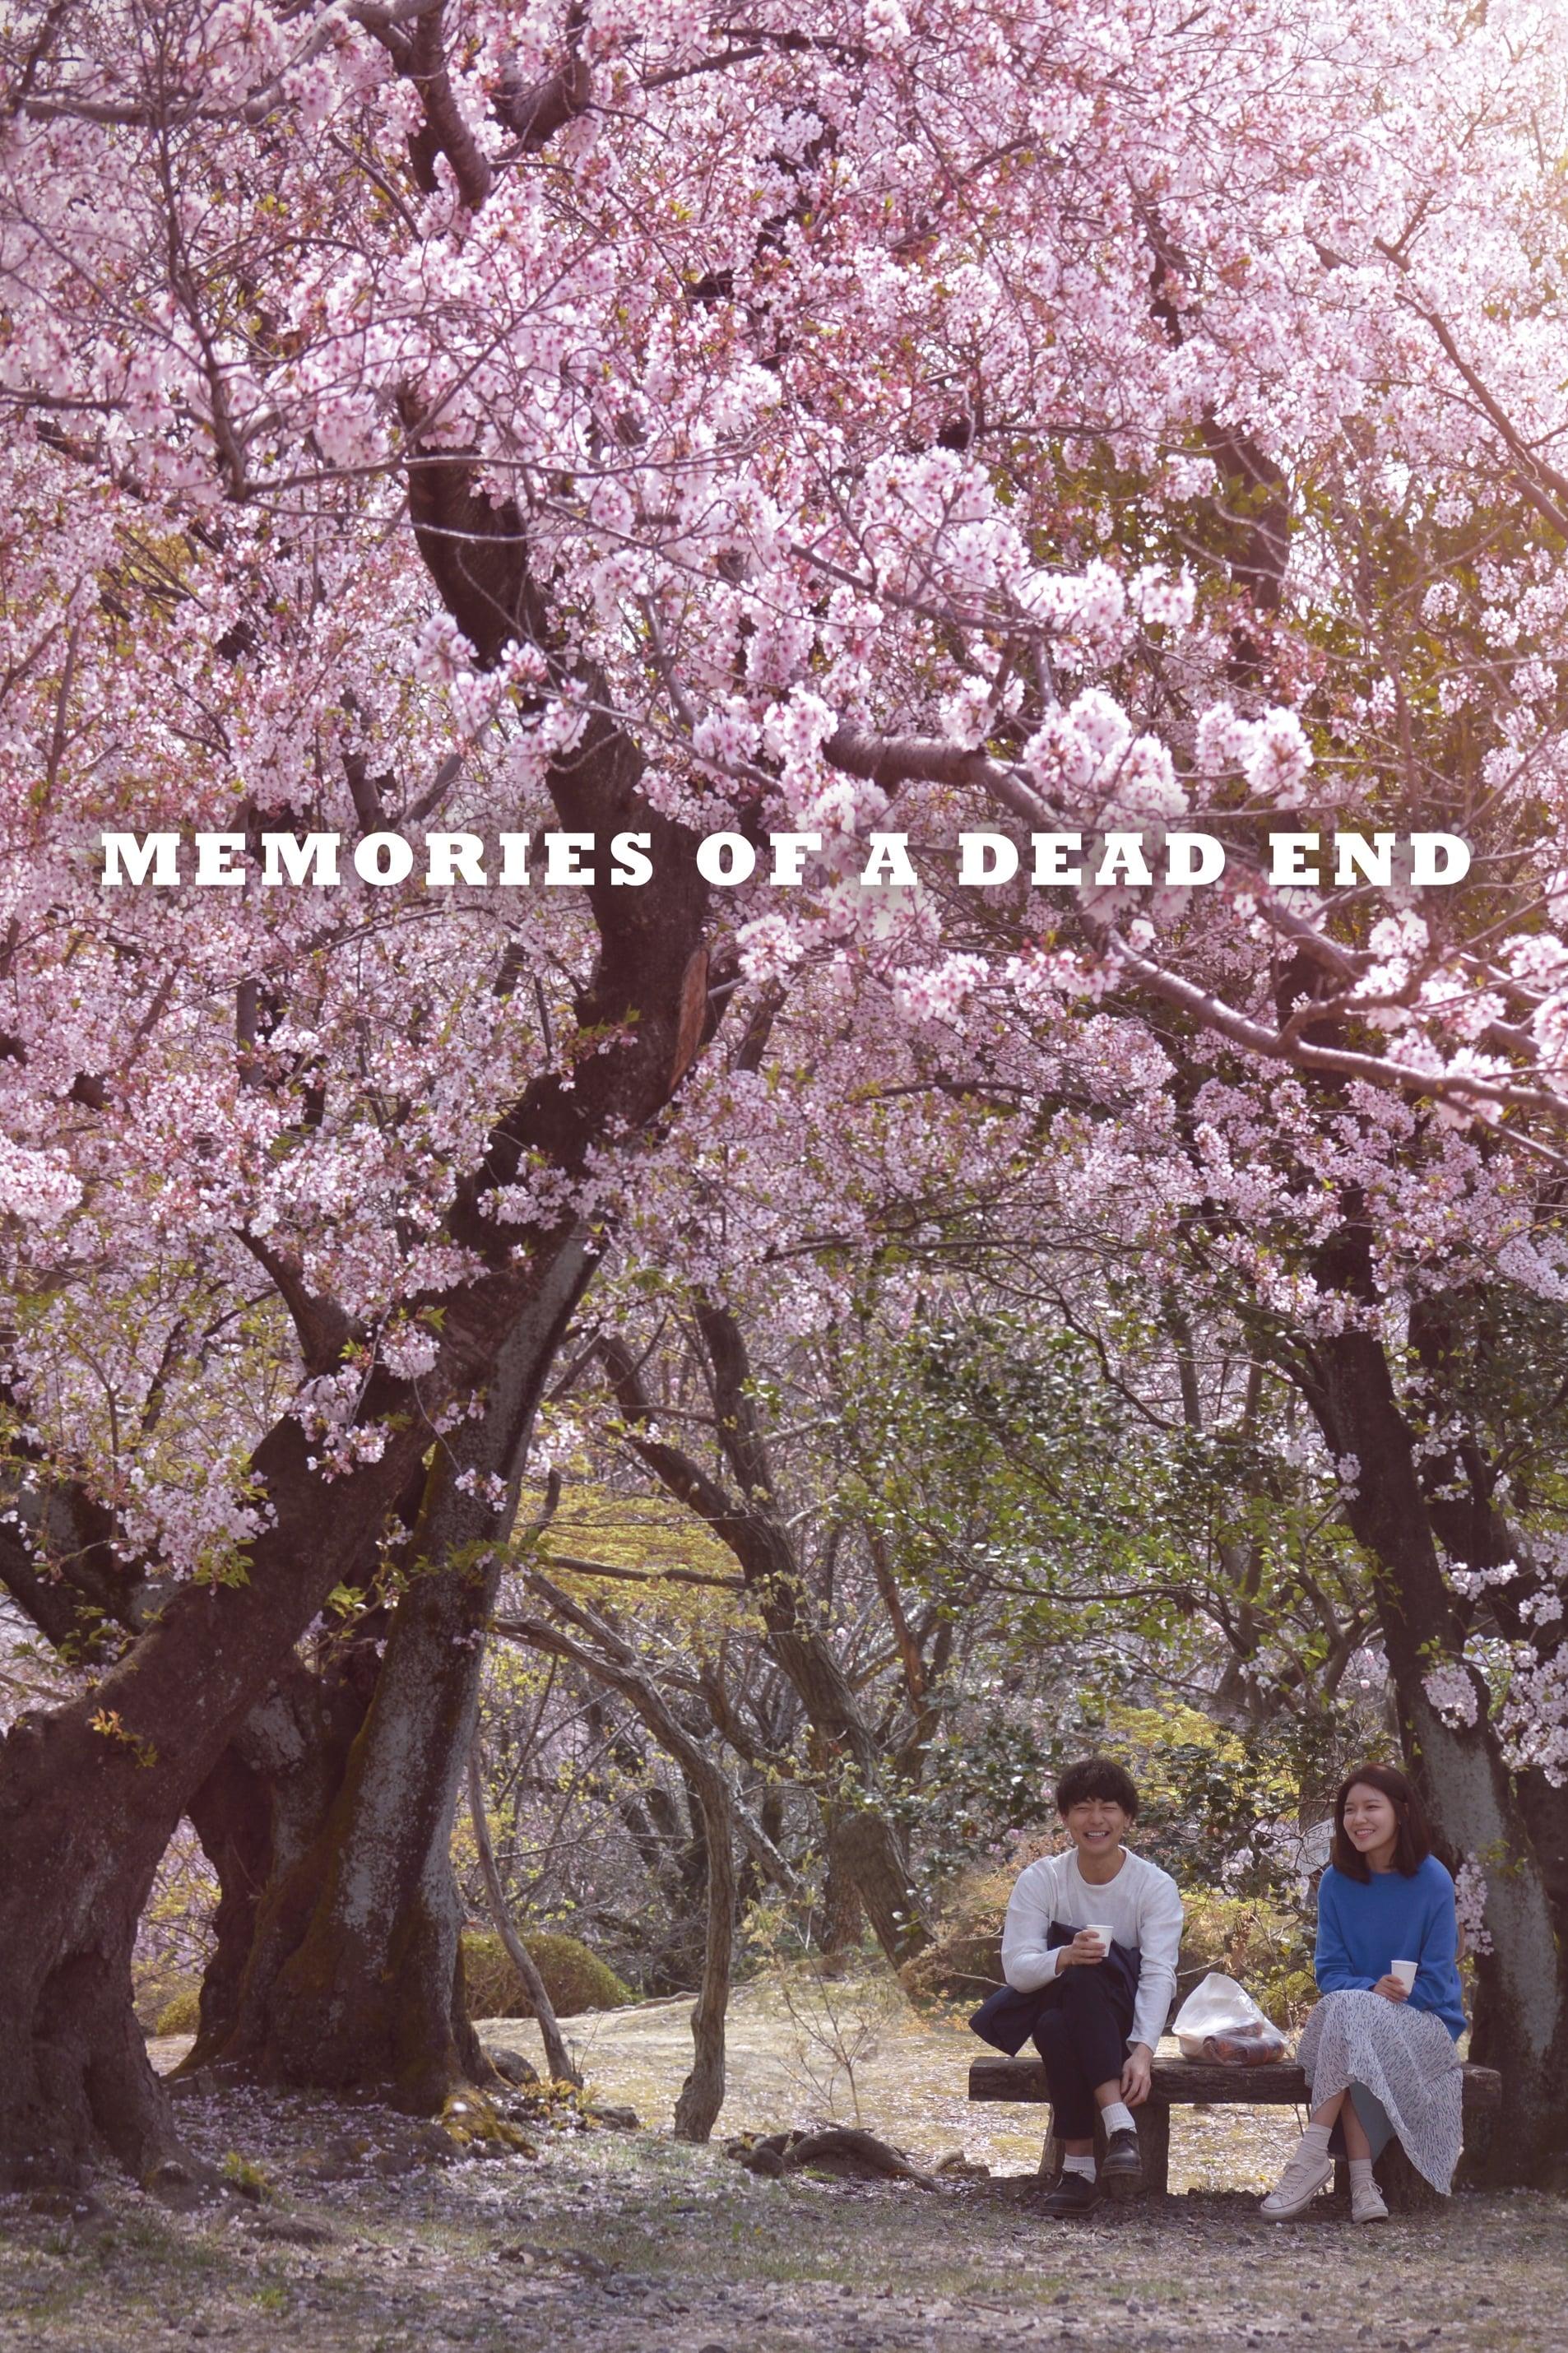 Memories of a Dead End